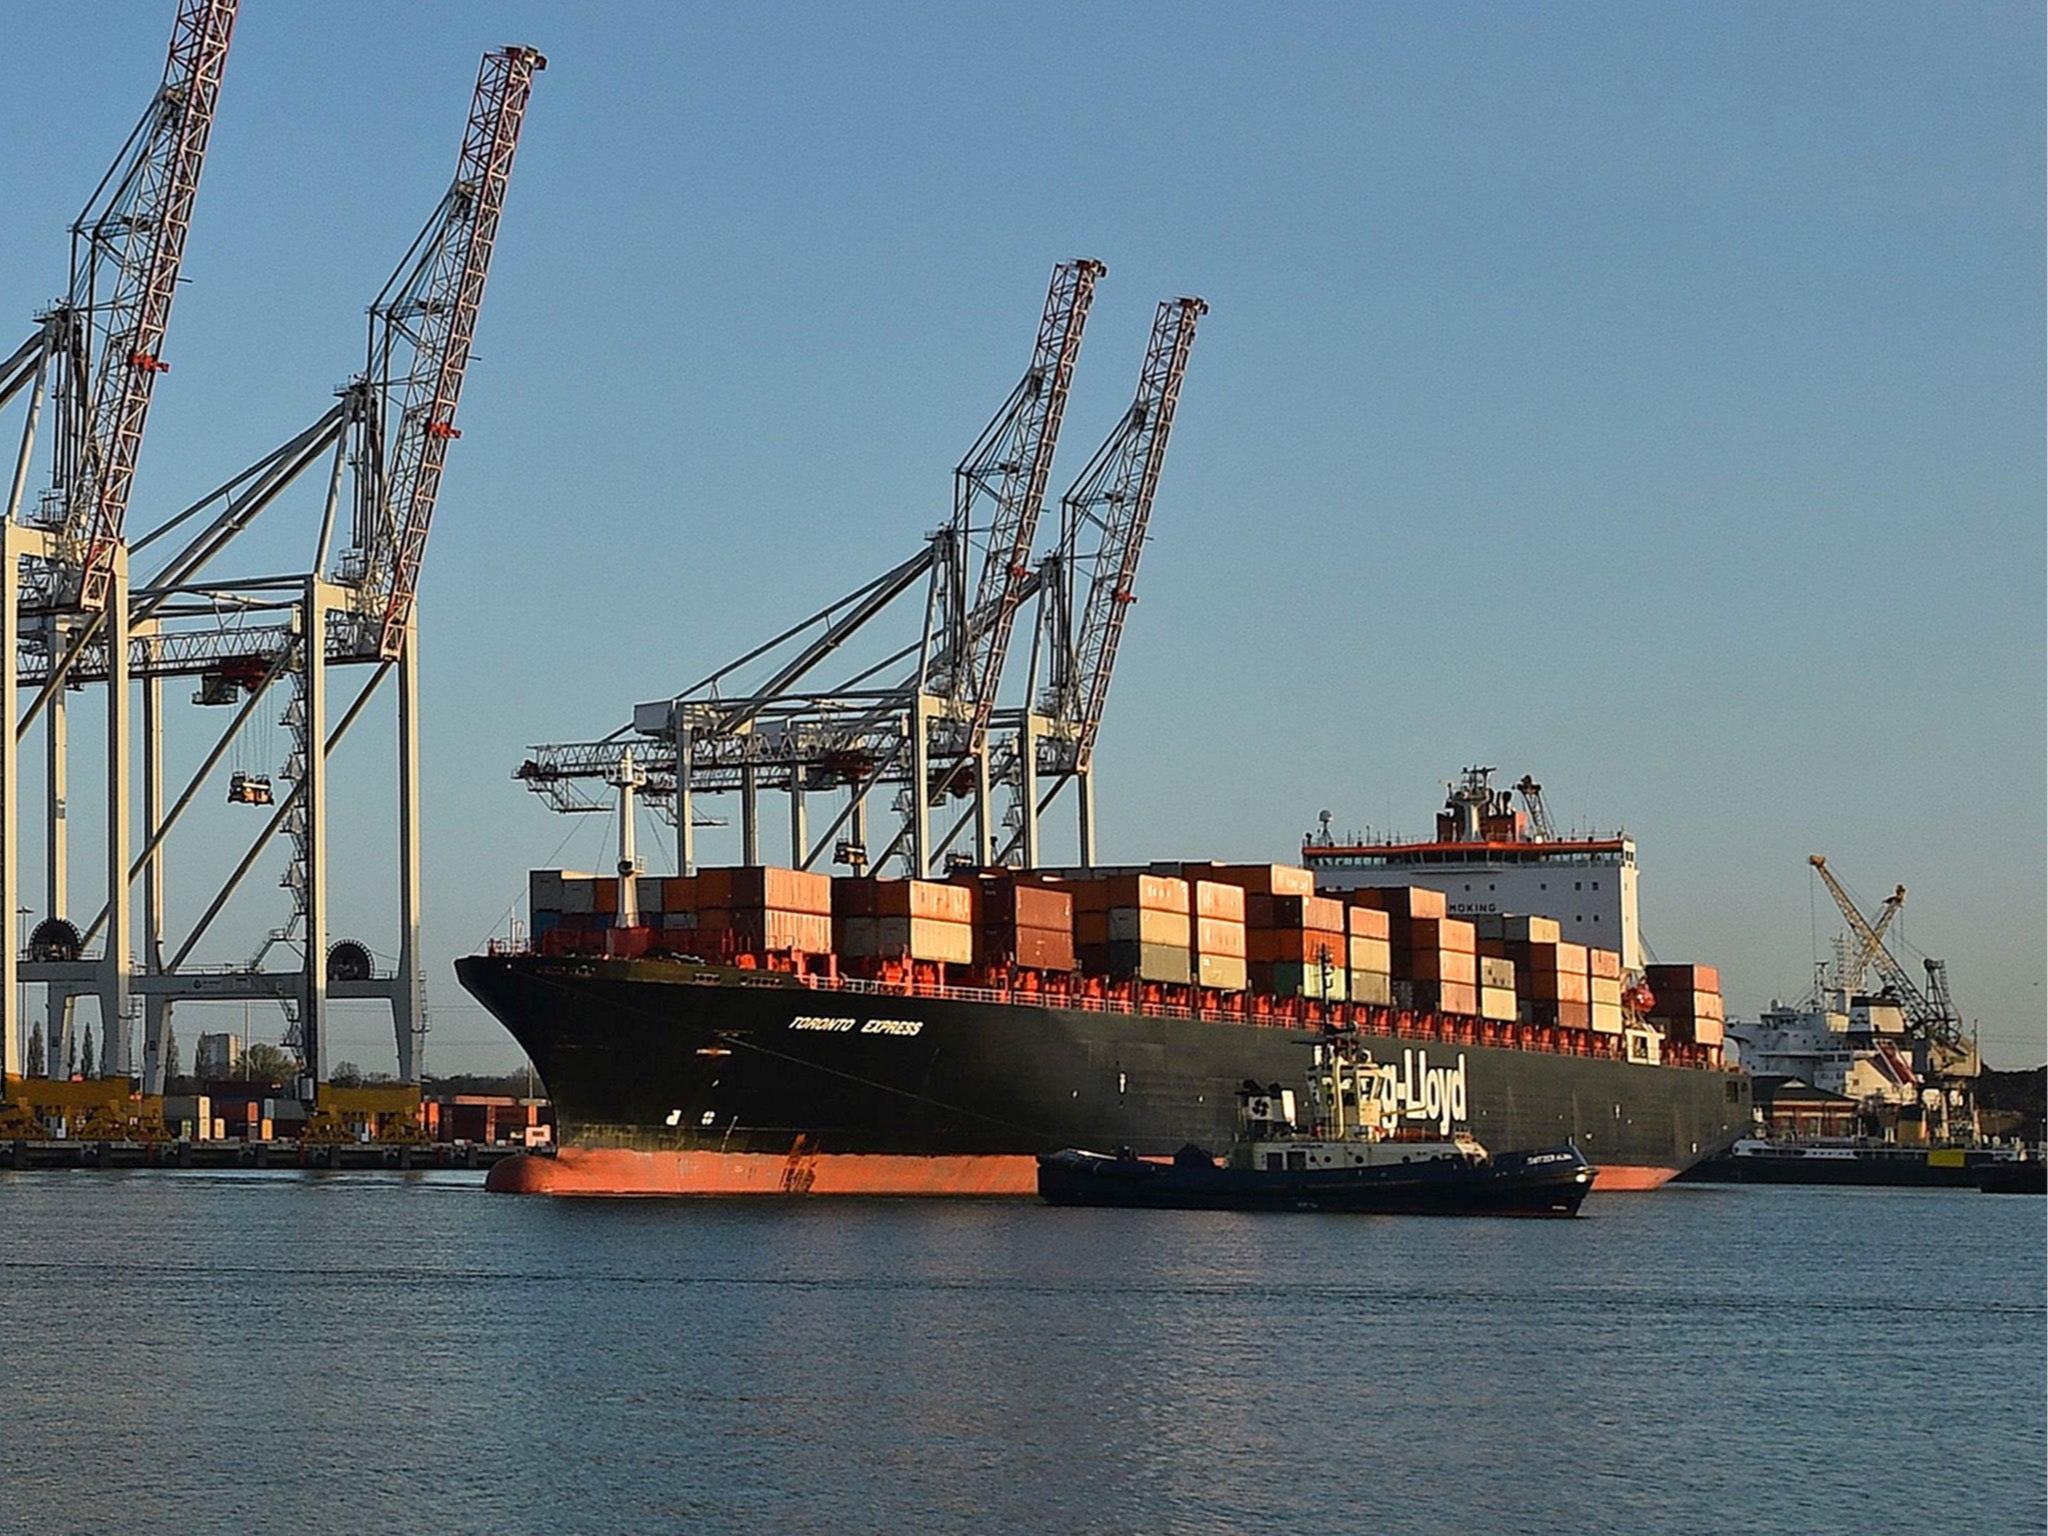 uk-shipping-port-2.jpg